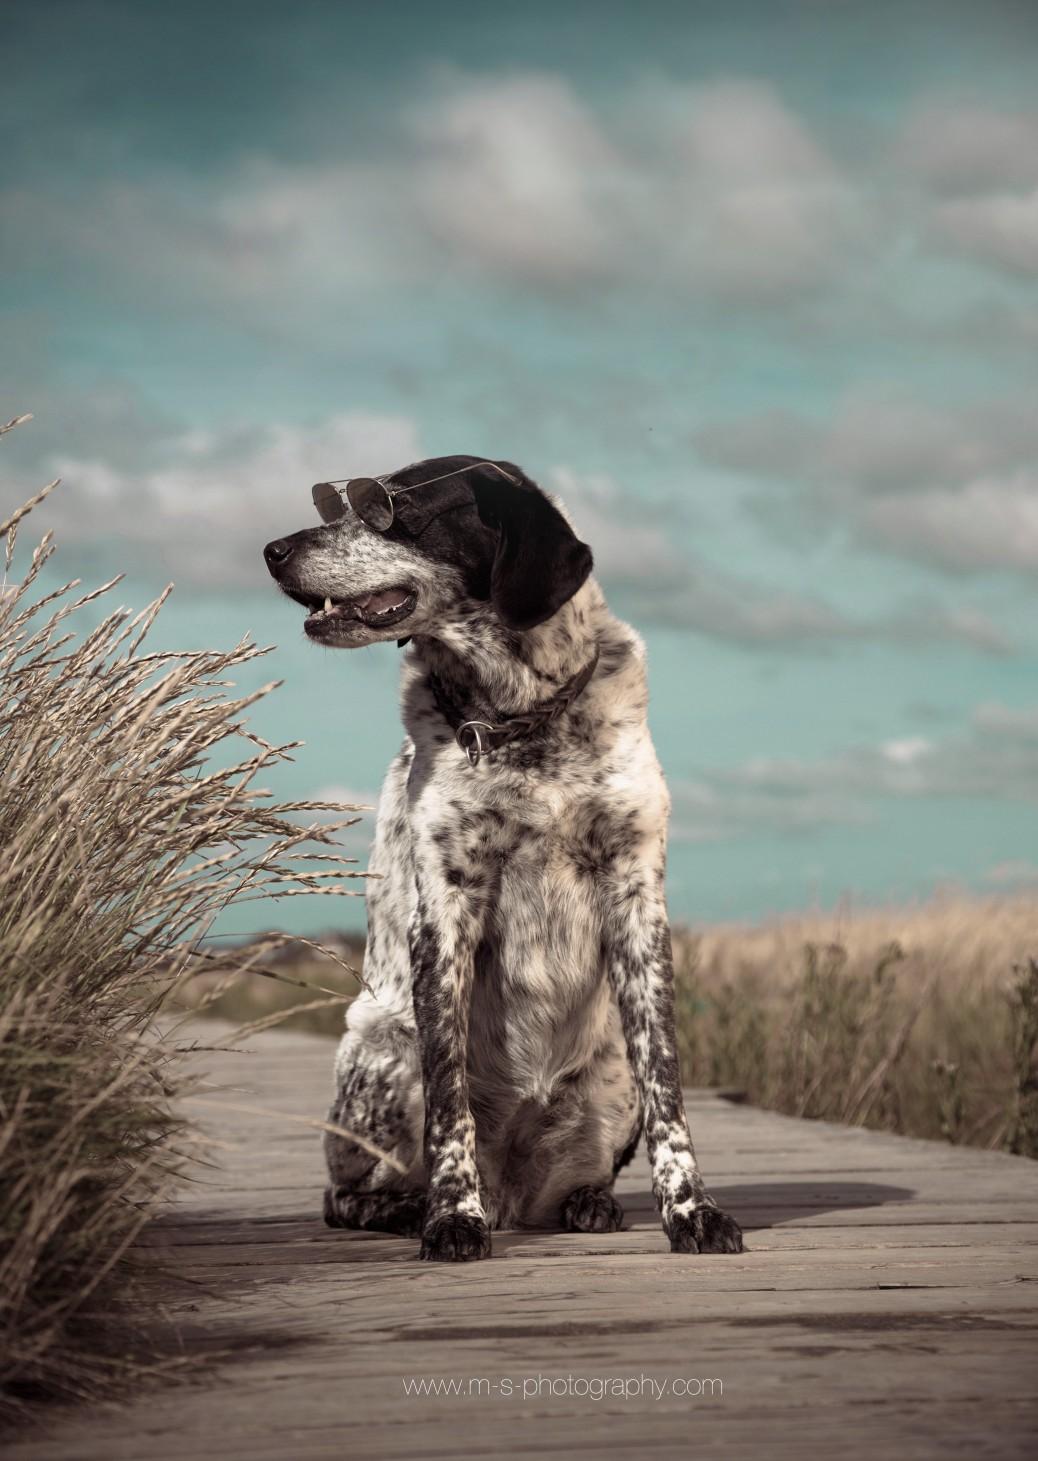 Hund am Steg